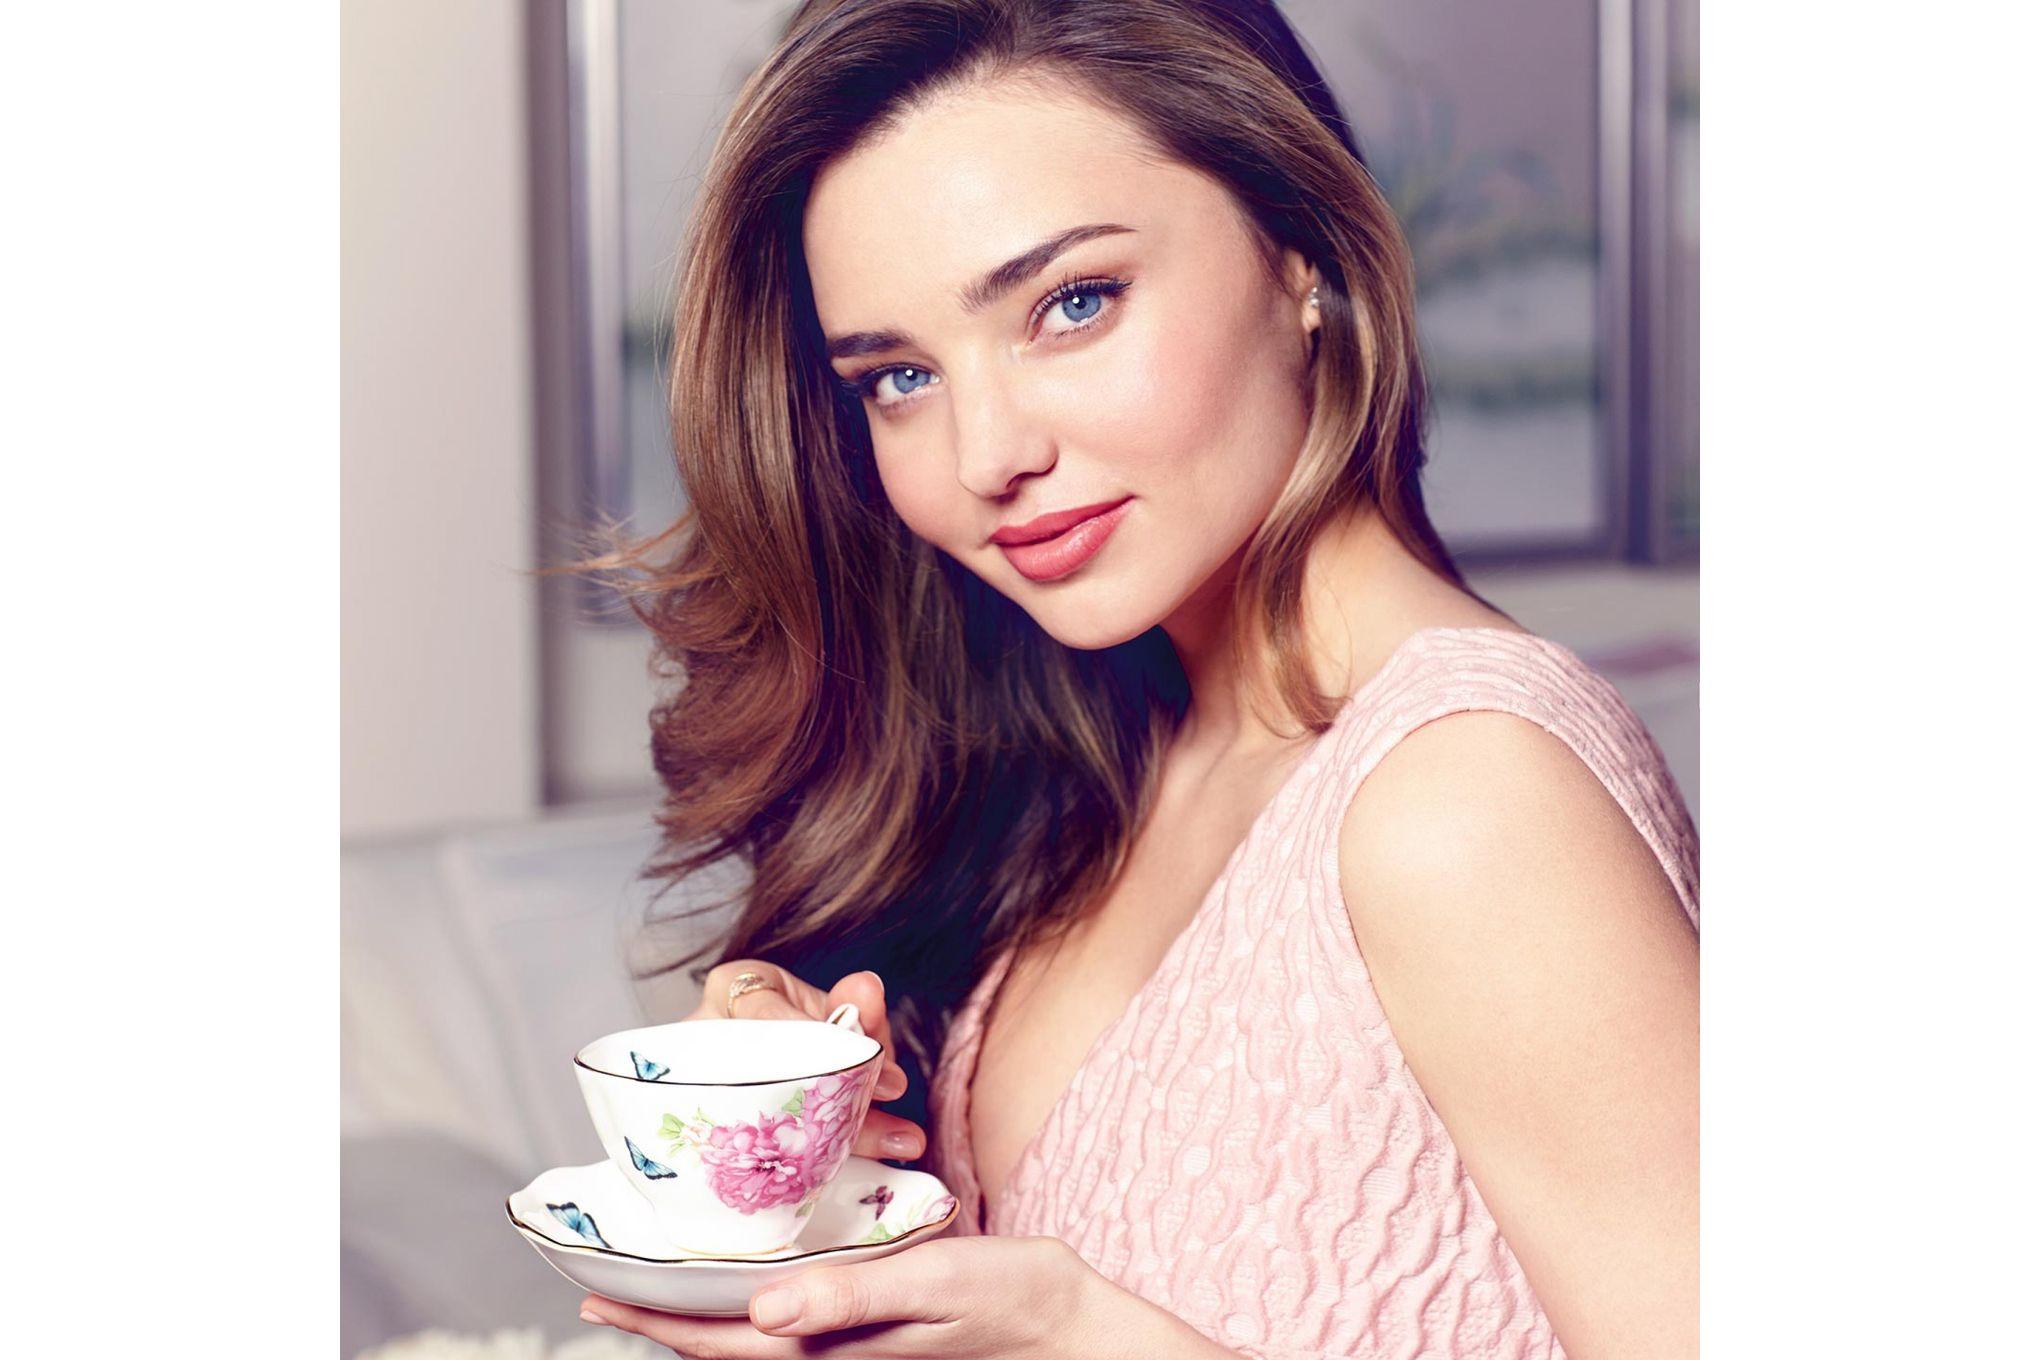 Miranda Kerr for Royal Albert Friendship Teacup & Saucer thumb 3